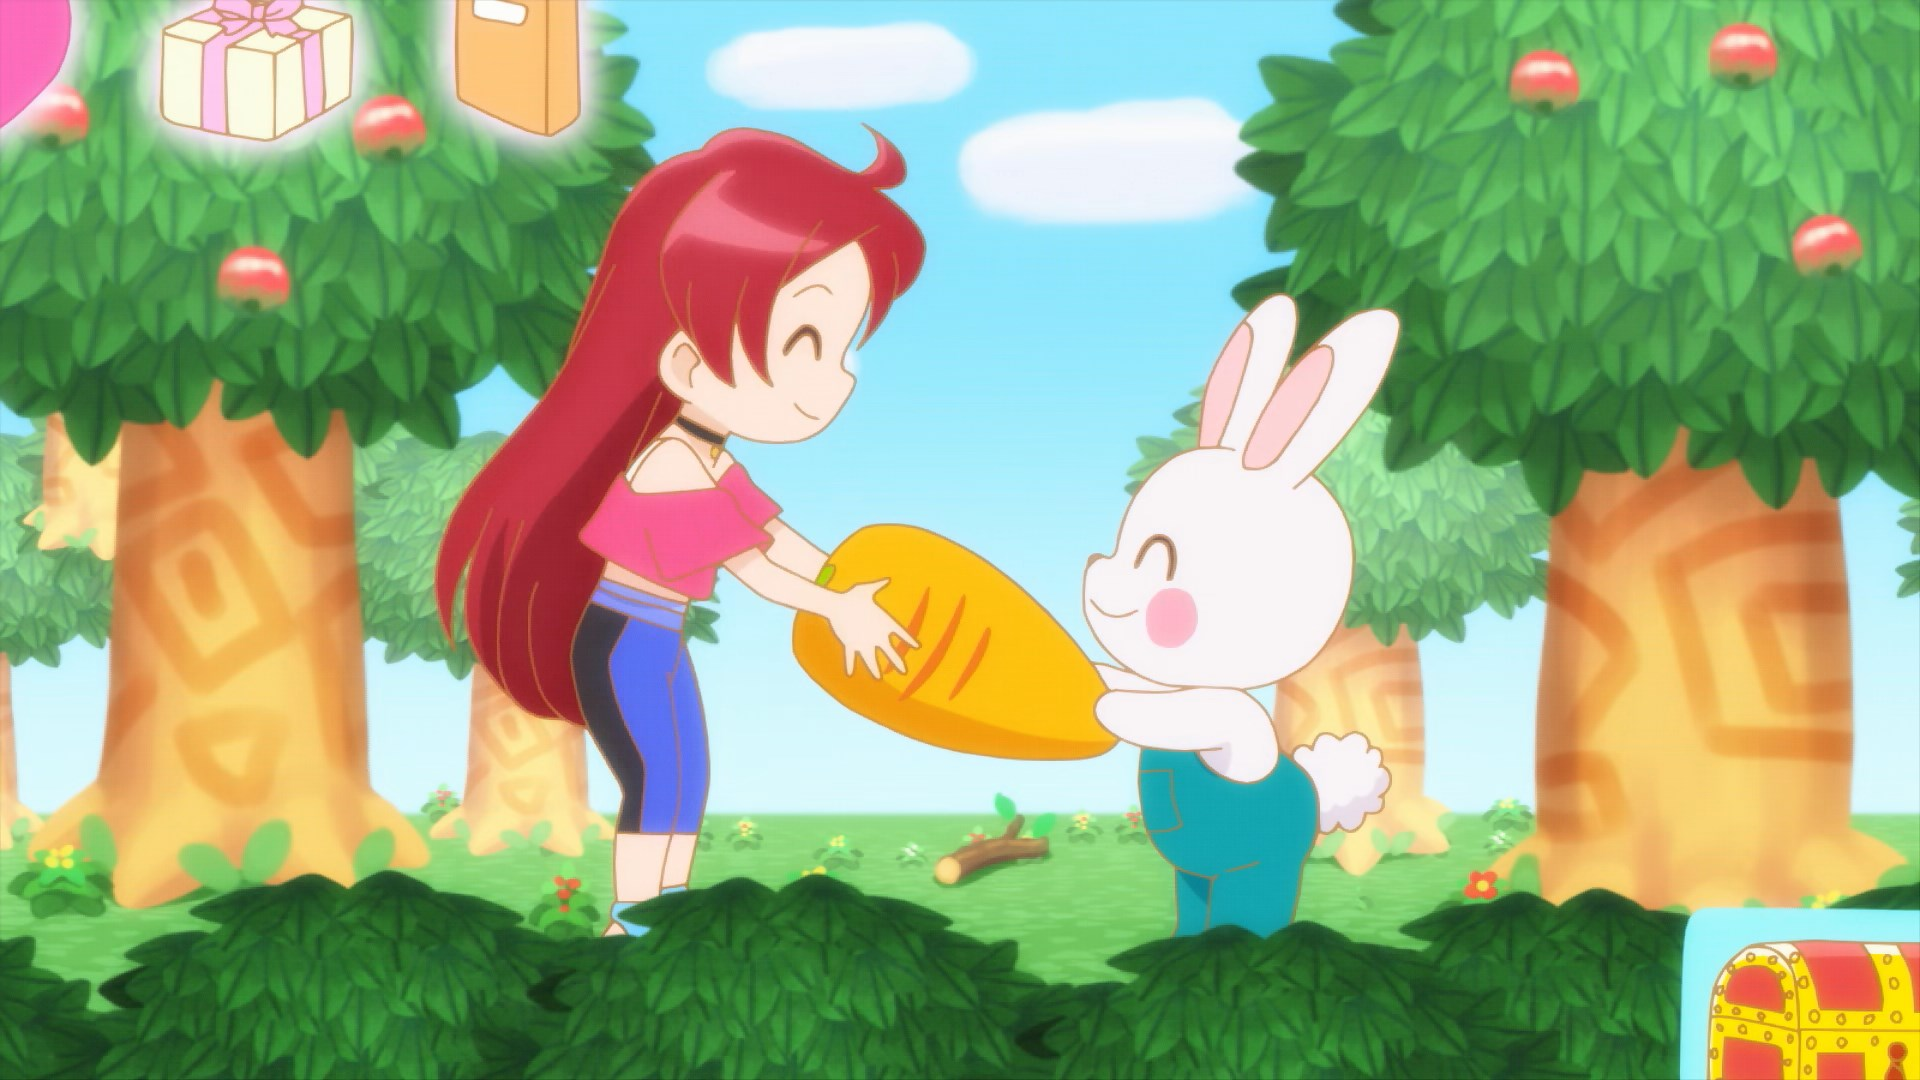 Asuka's RPG Game